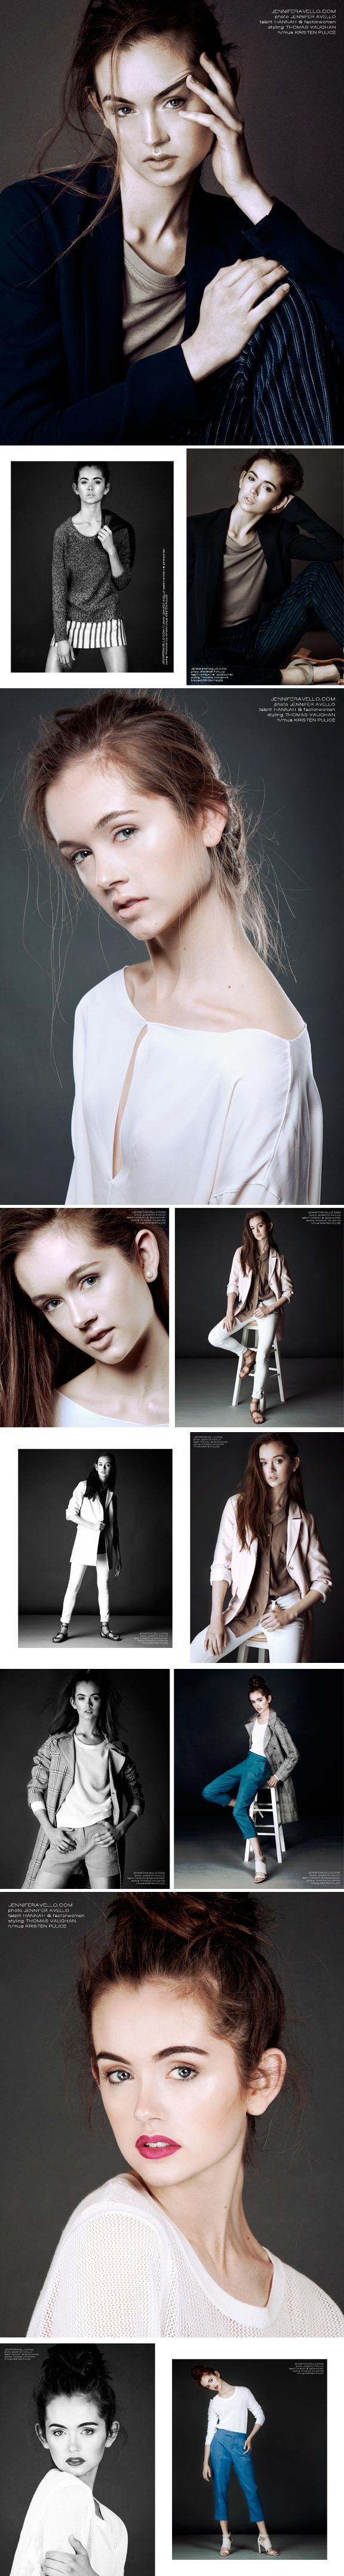 Chicago-Fashion-Photographer_Jennifer-Avello_FW_Hannah_Test